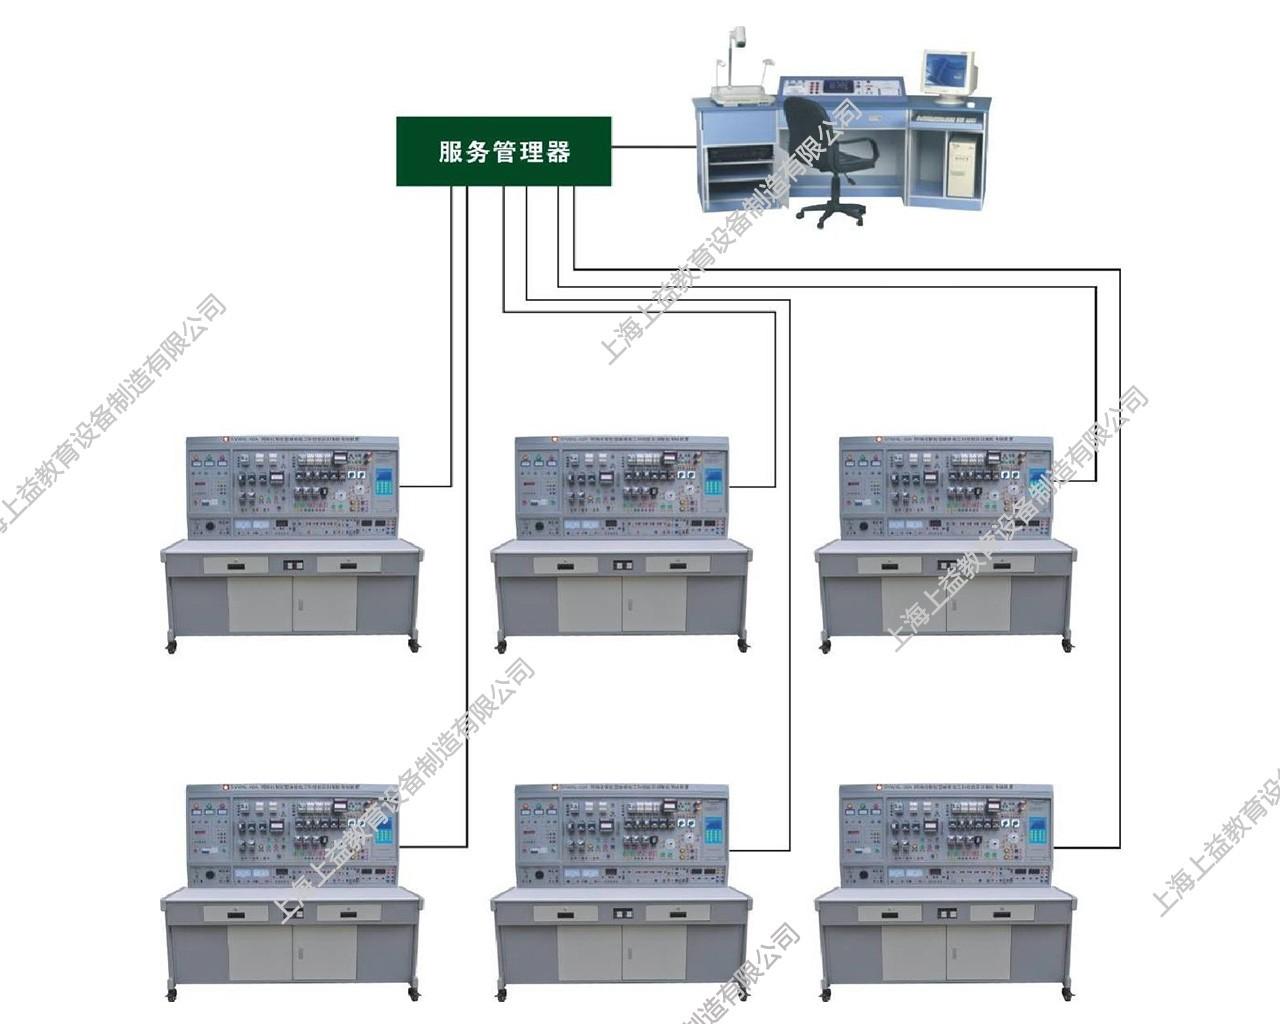 SYWXL-02A 网络化智能型维修电工和技能wwwlehu8vip智能lehu68vip装置